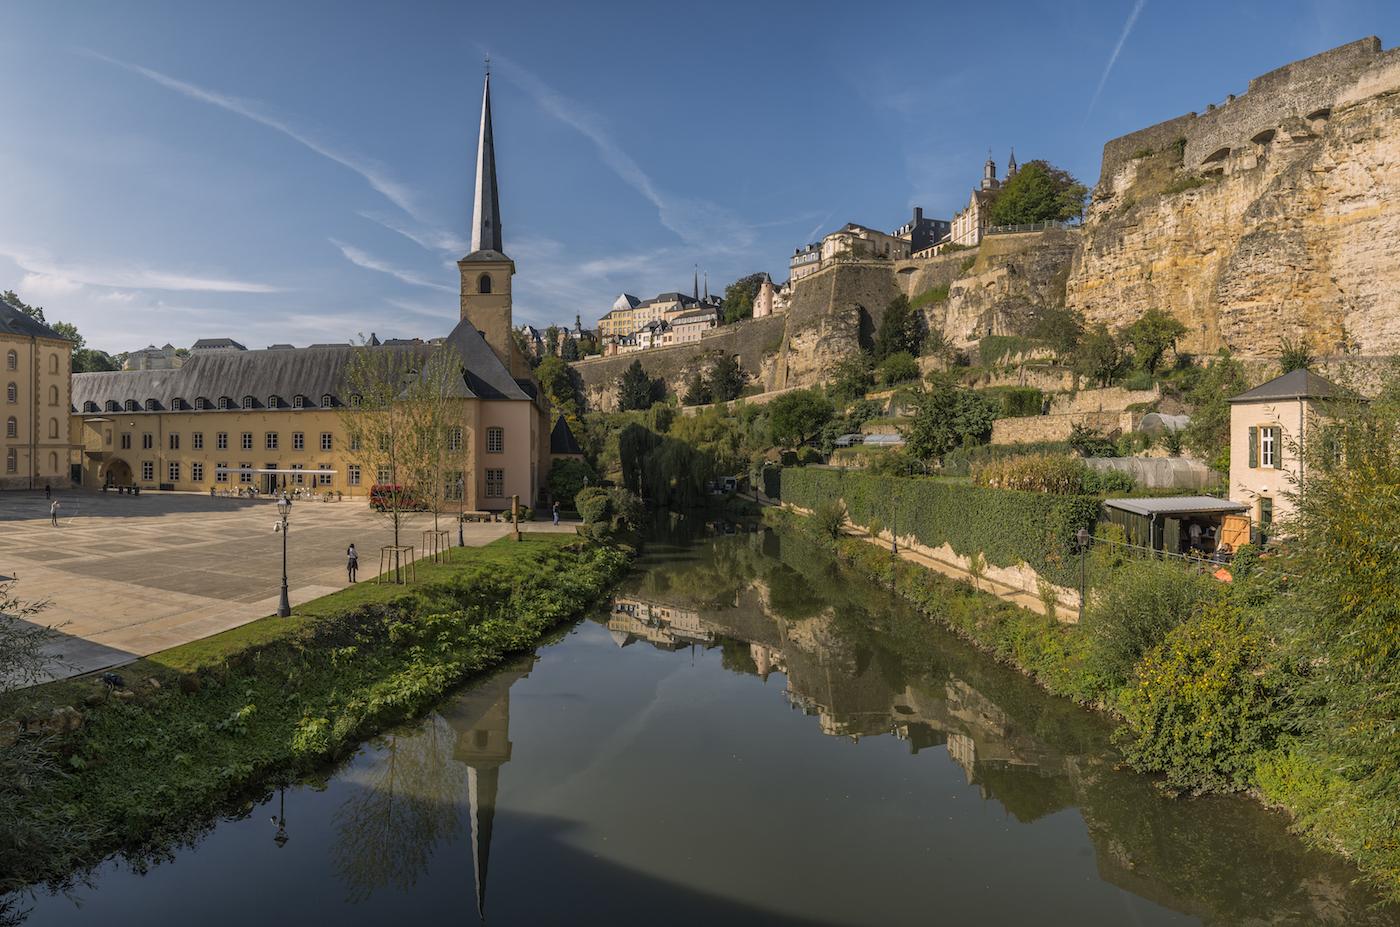 Uno scorcio della Vieille ville a Lussemburgo - foto A. Salgueiro www.alsalphotography.com/LFT